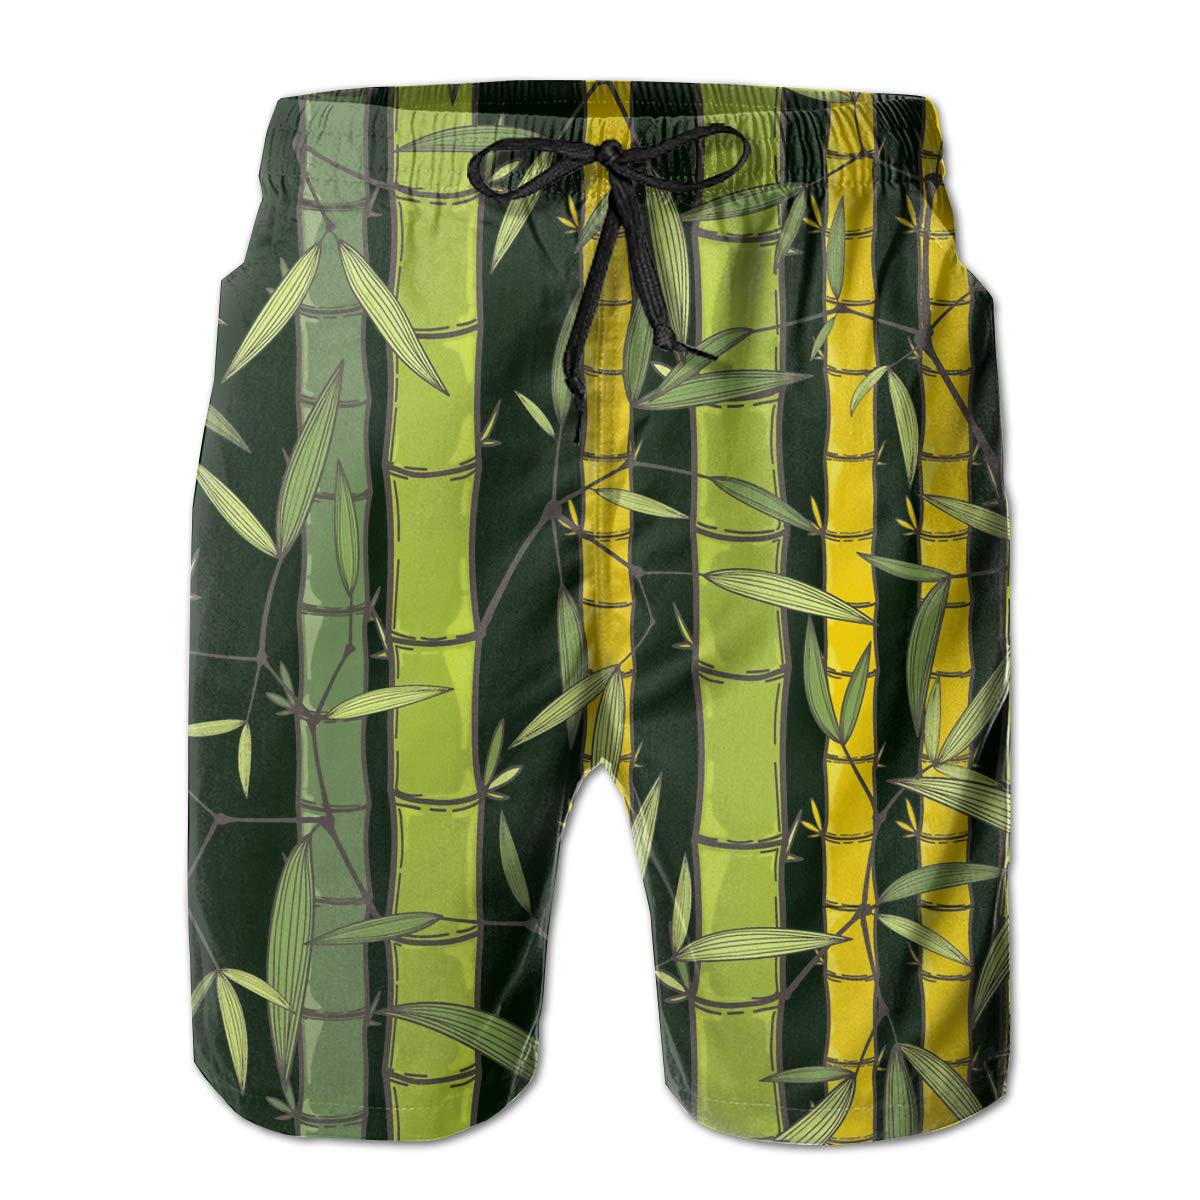 SARA NELL Mens Swim Trunks Chinese Or Japanese Bamboo Grass Oriental Surfing Beach Board Shorts Swimwear